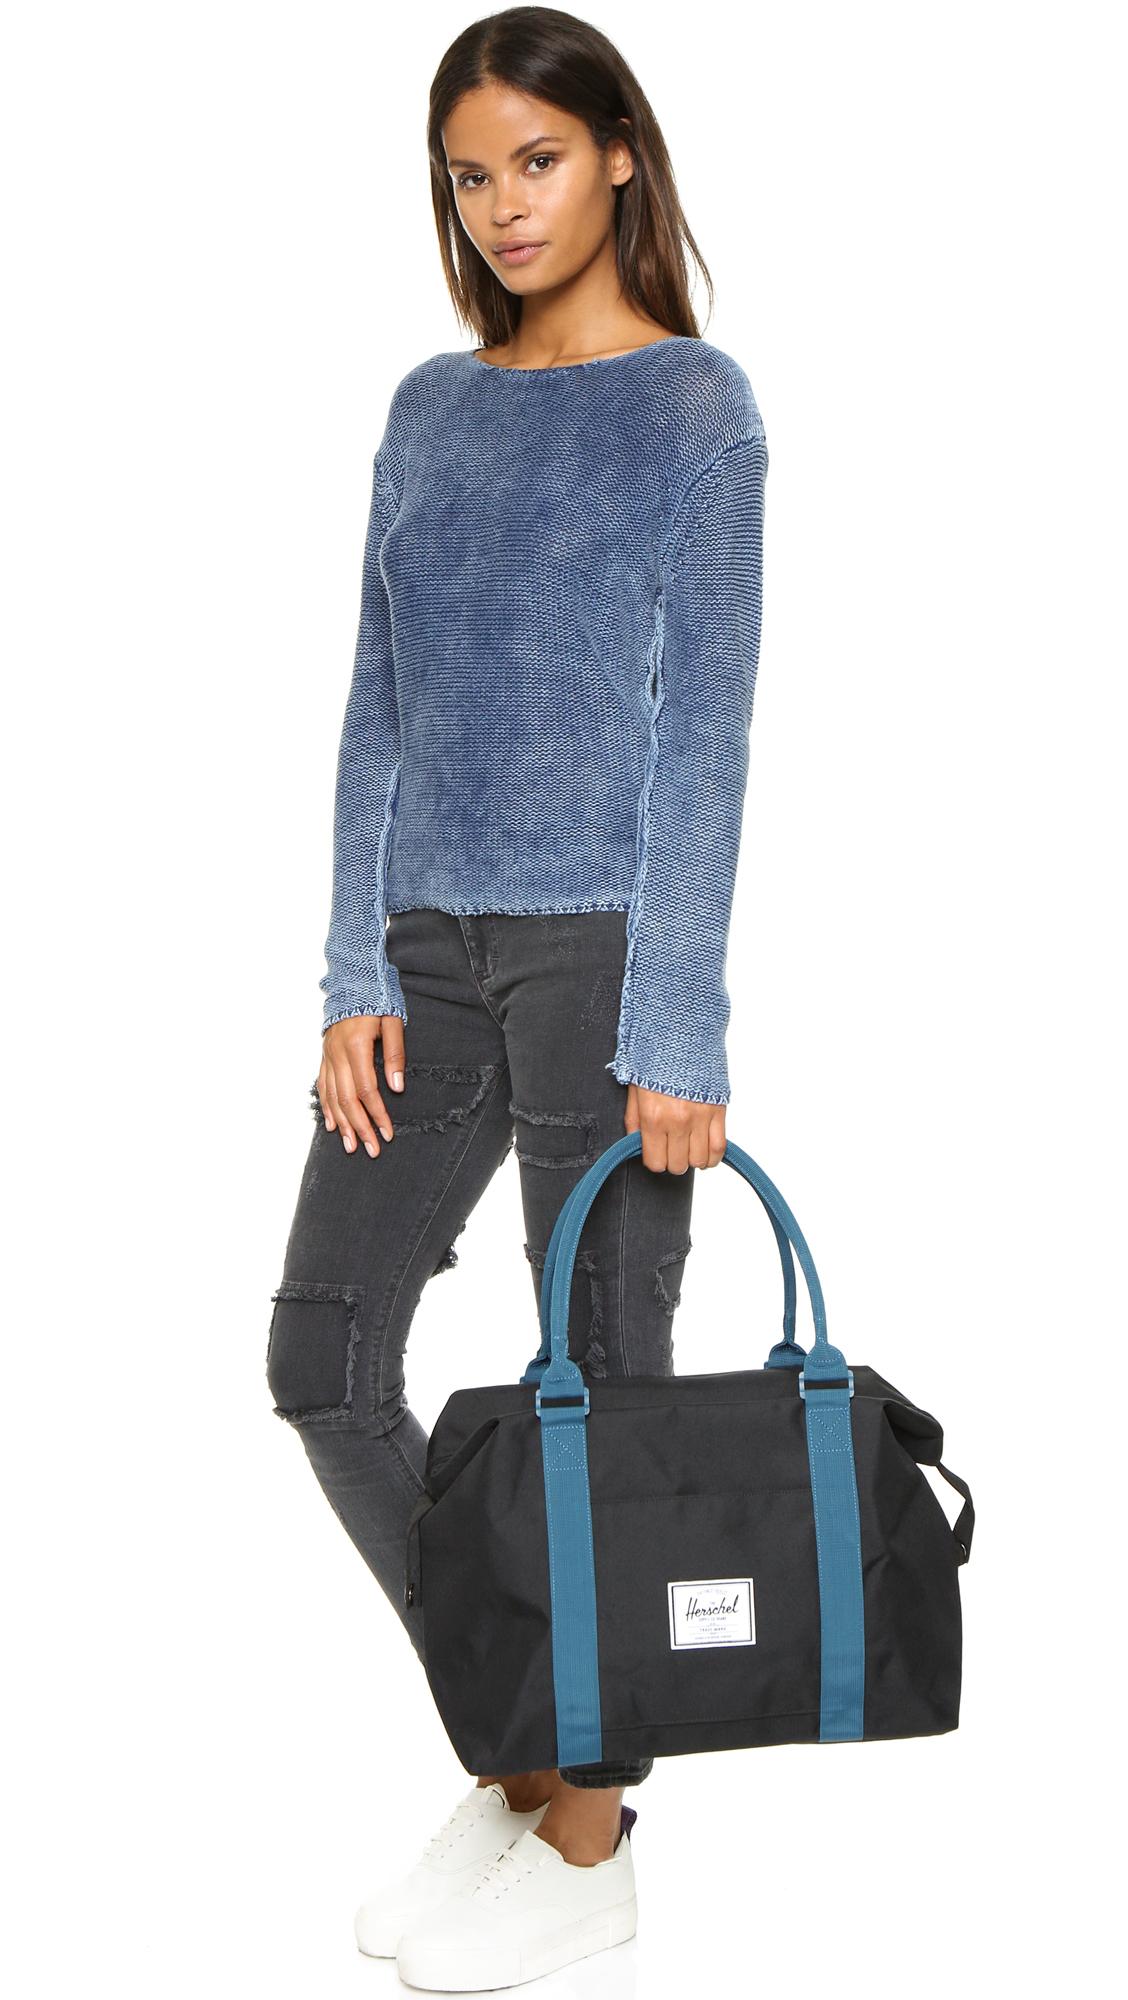 c0ccad55b Herschel Supply Co. Strand Duffel Bag - Black/ink Blue in Black - Lyst